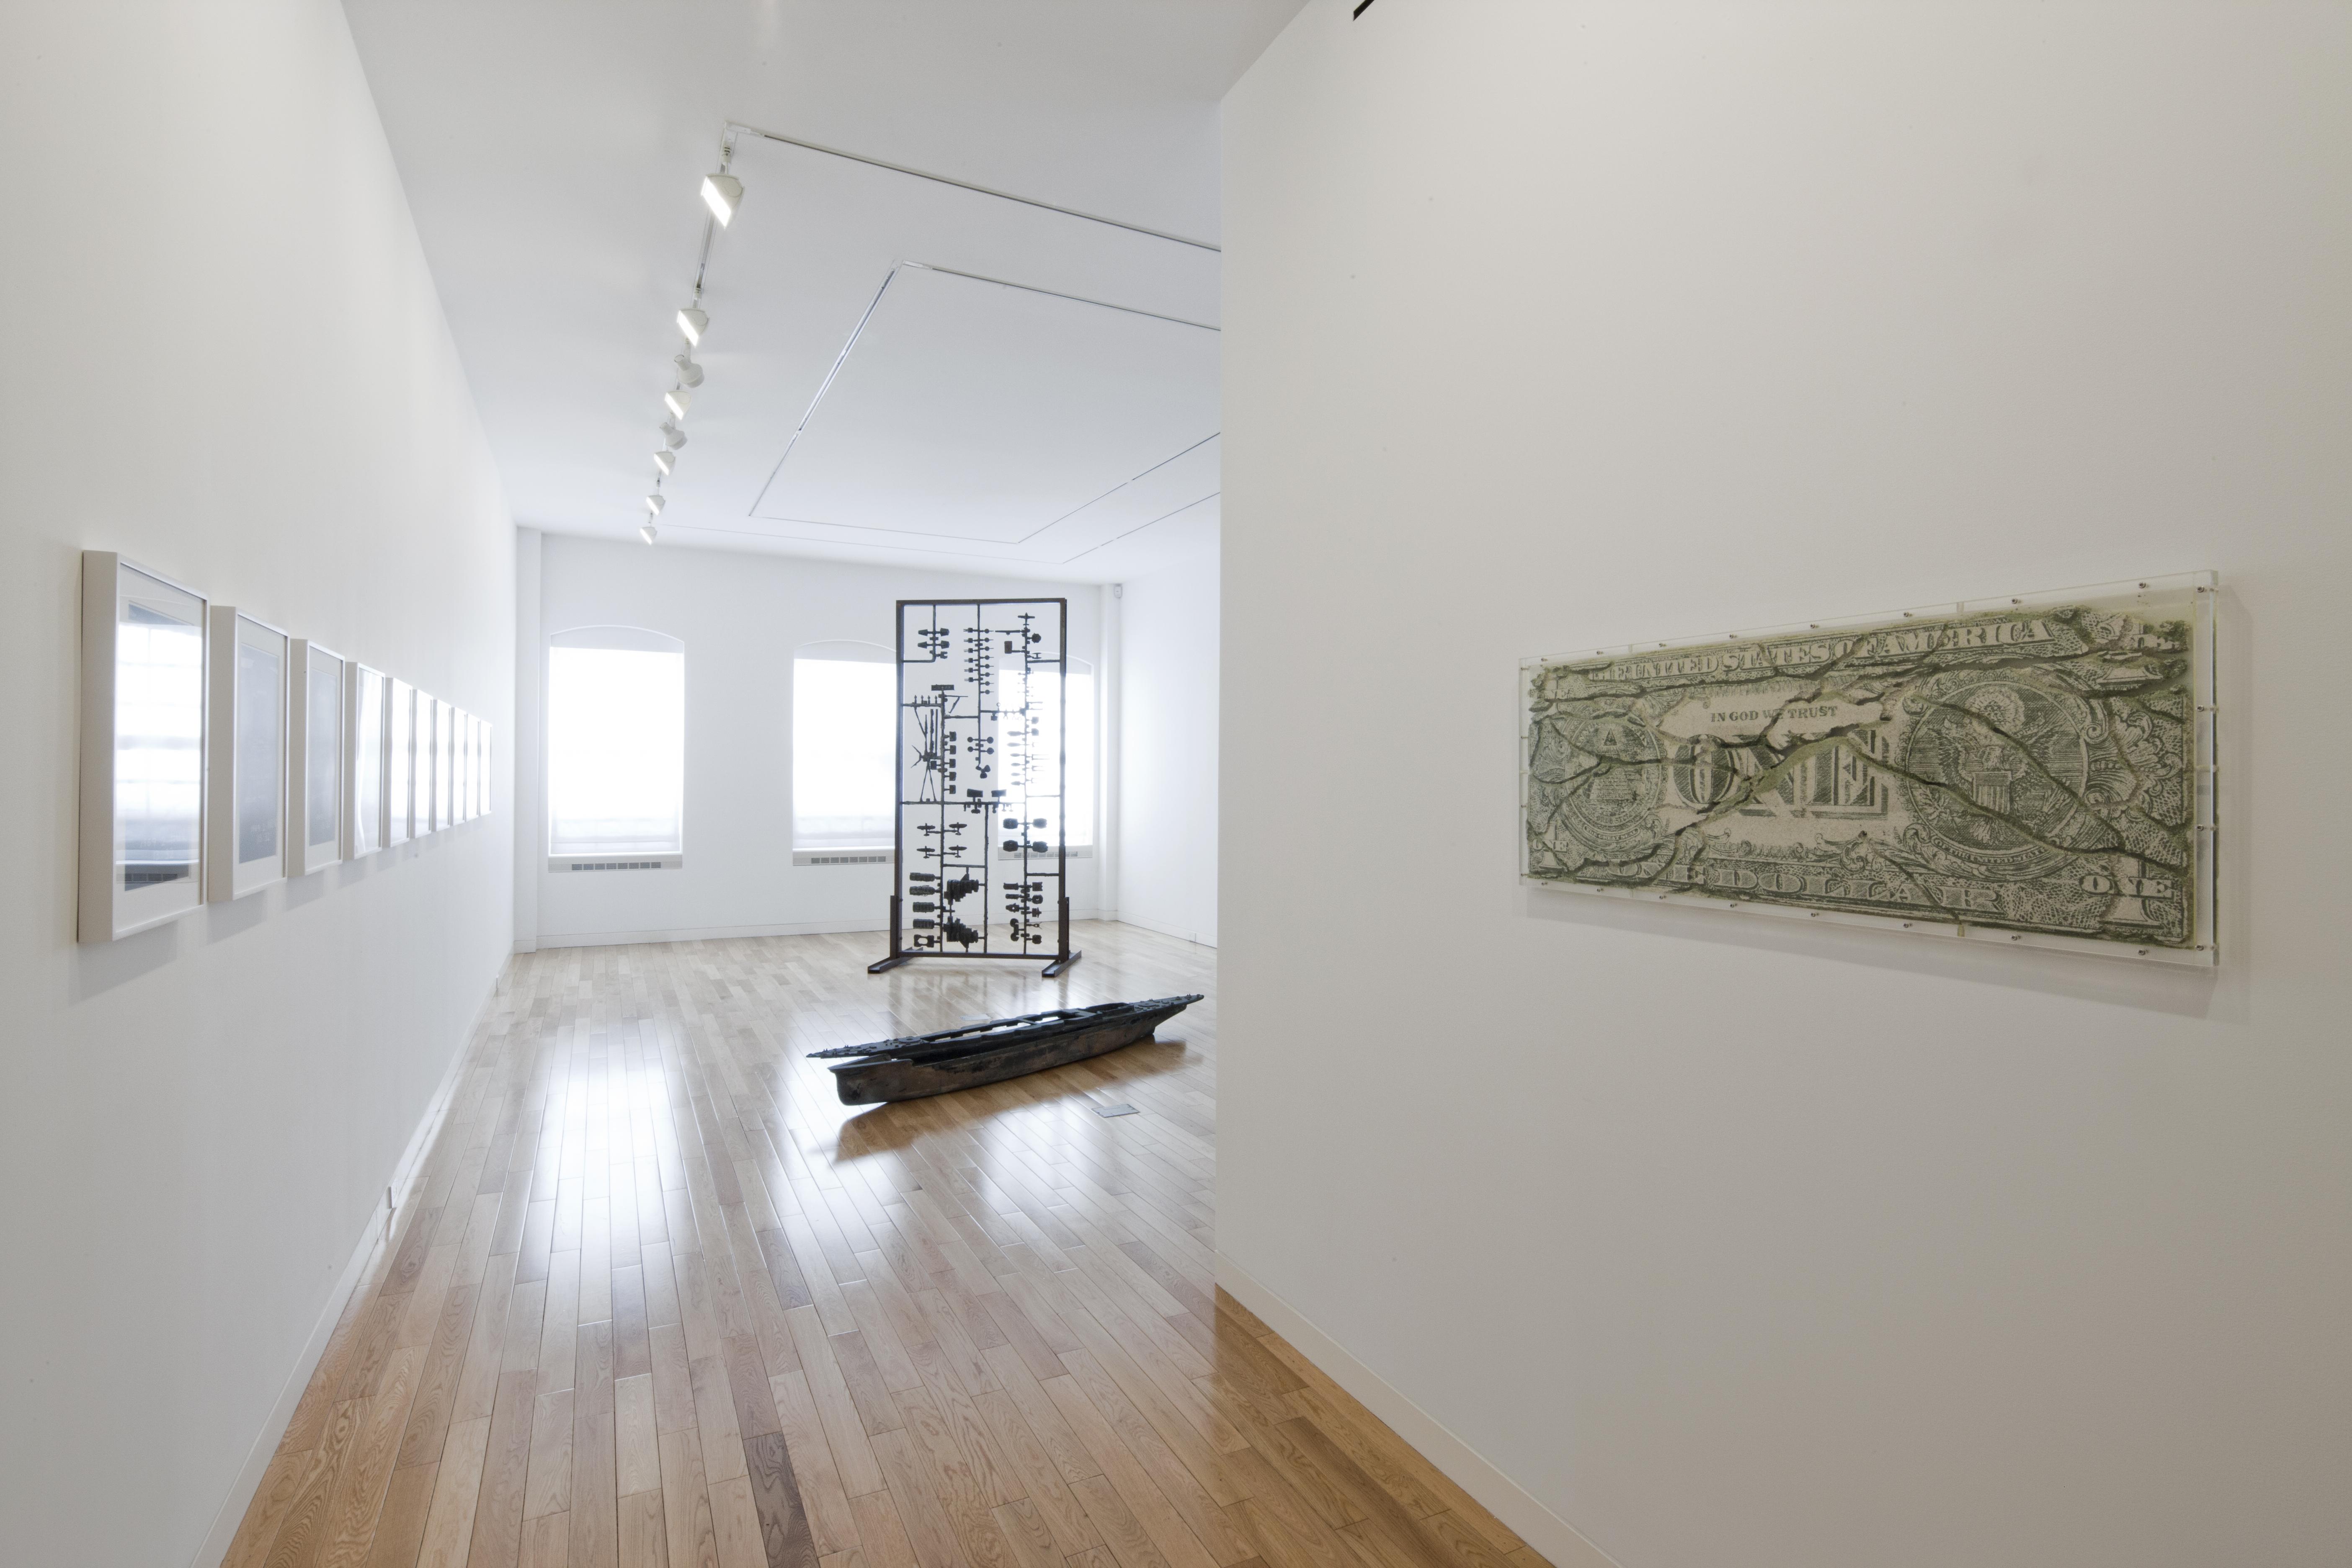 Photograph 1 from Nomura, Polke, Yanagi: Works in Progress exhibition.